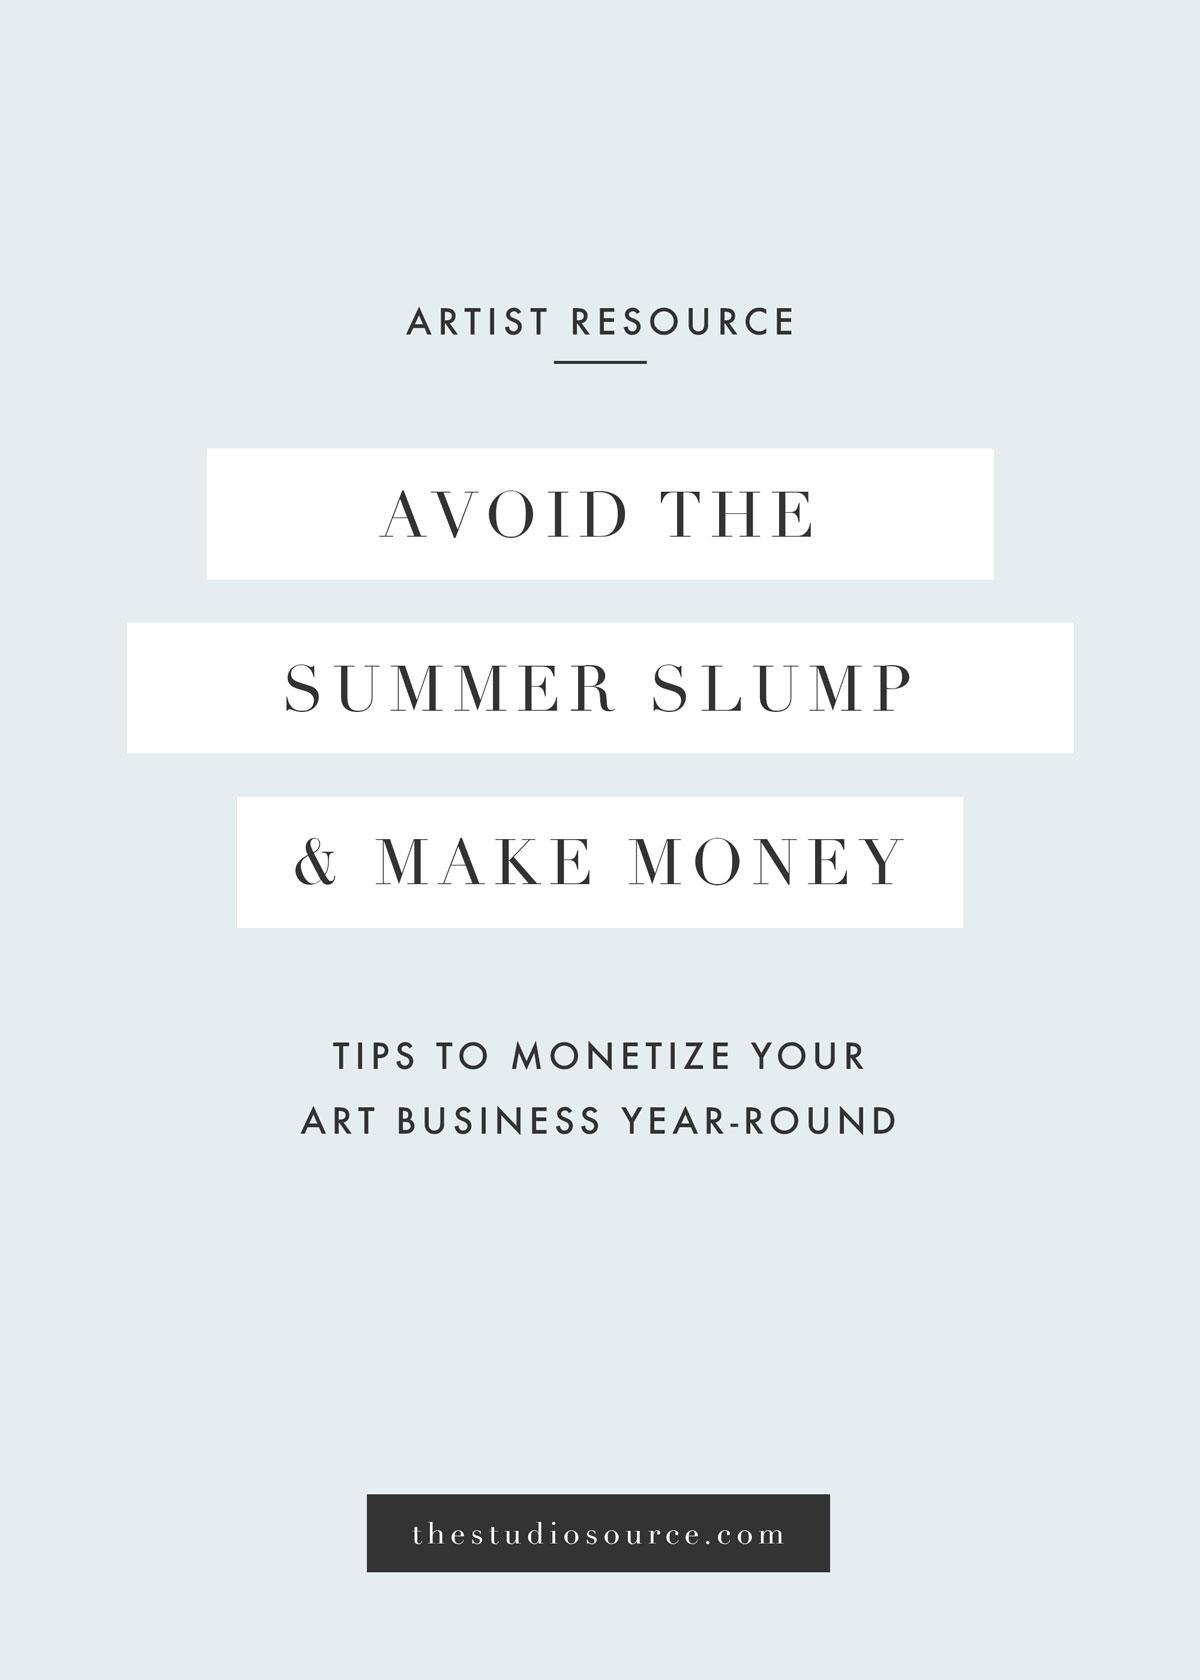 TSS-Avoid-the-summer-slump-blog-post.jpg